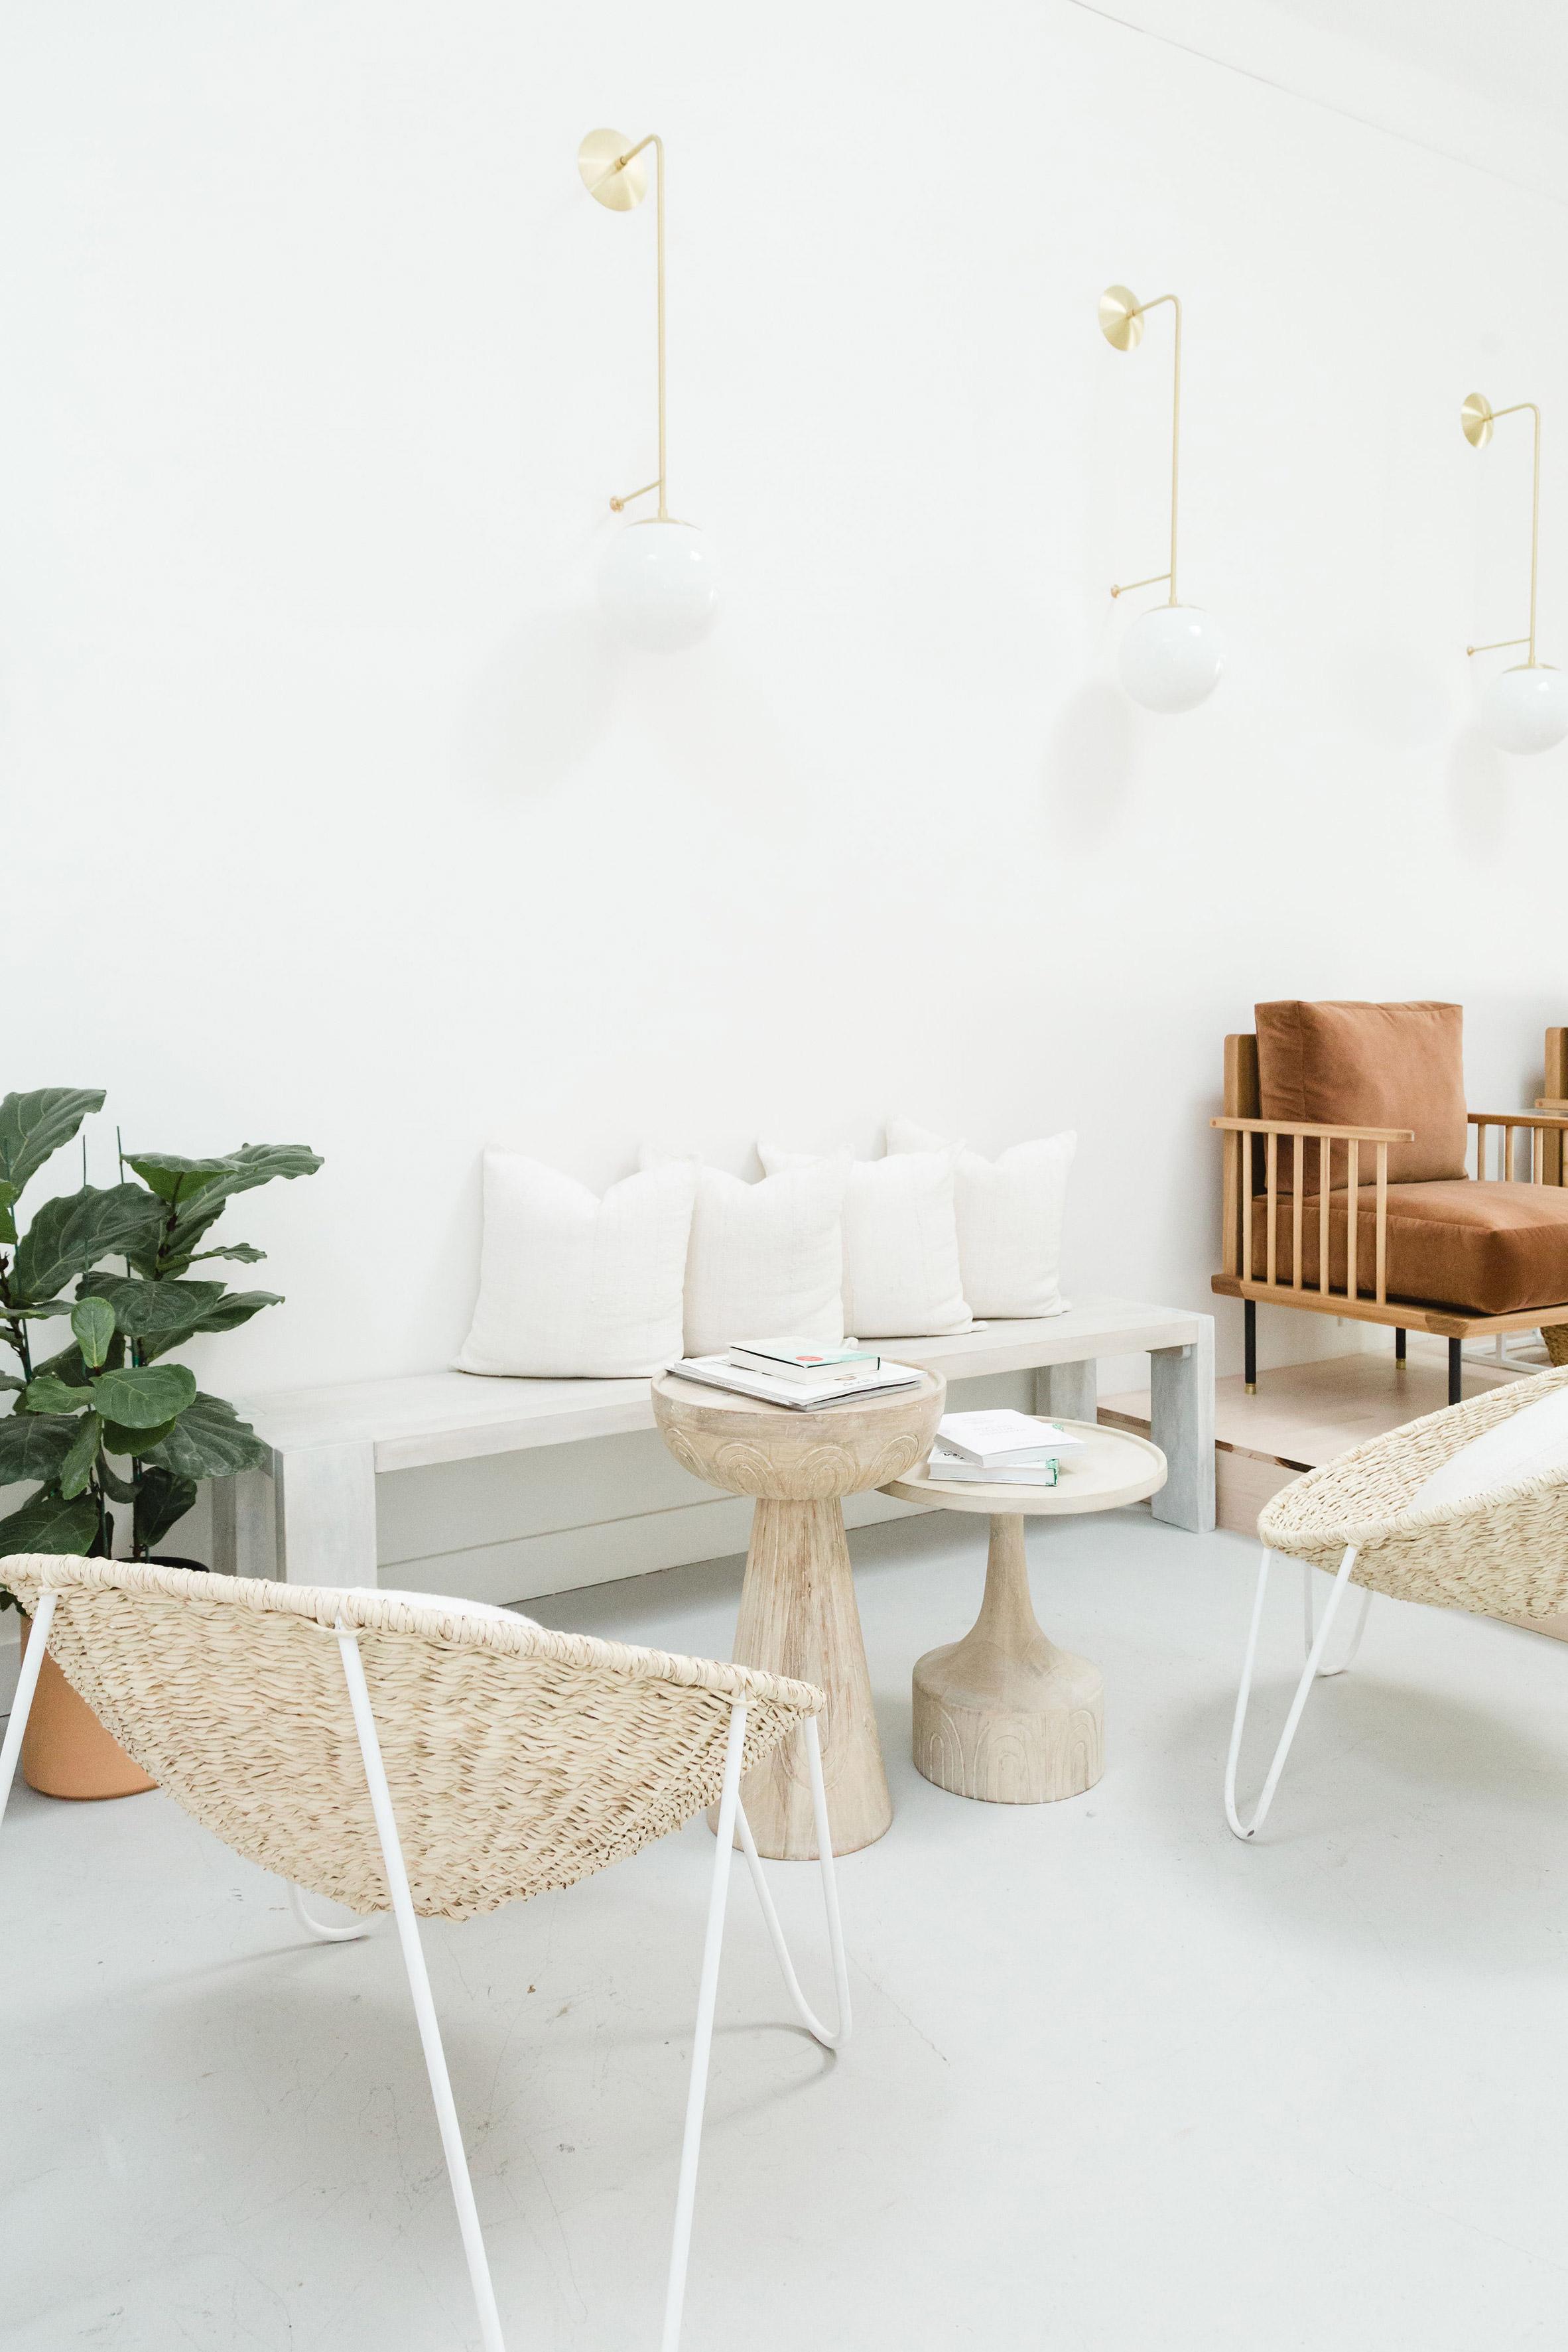 Leo Nail Salon by Solstice Interiors